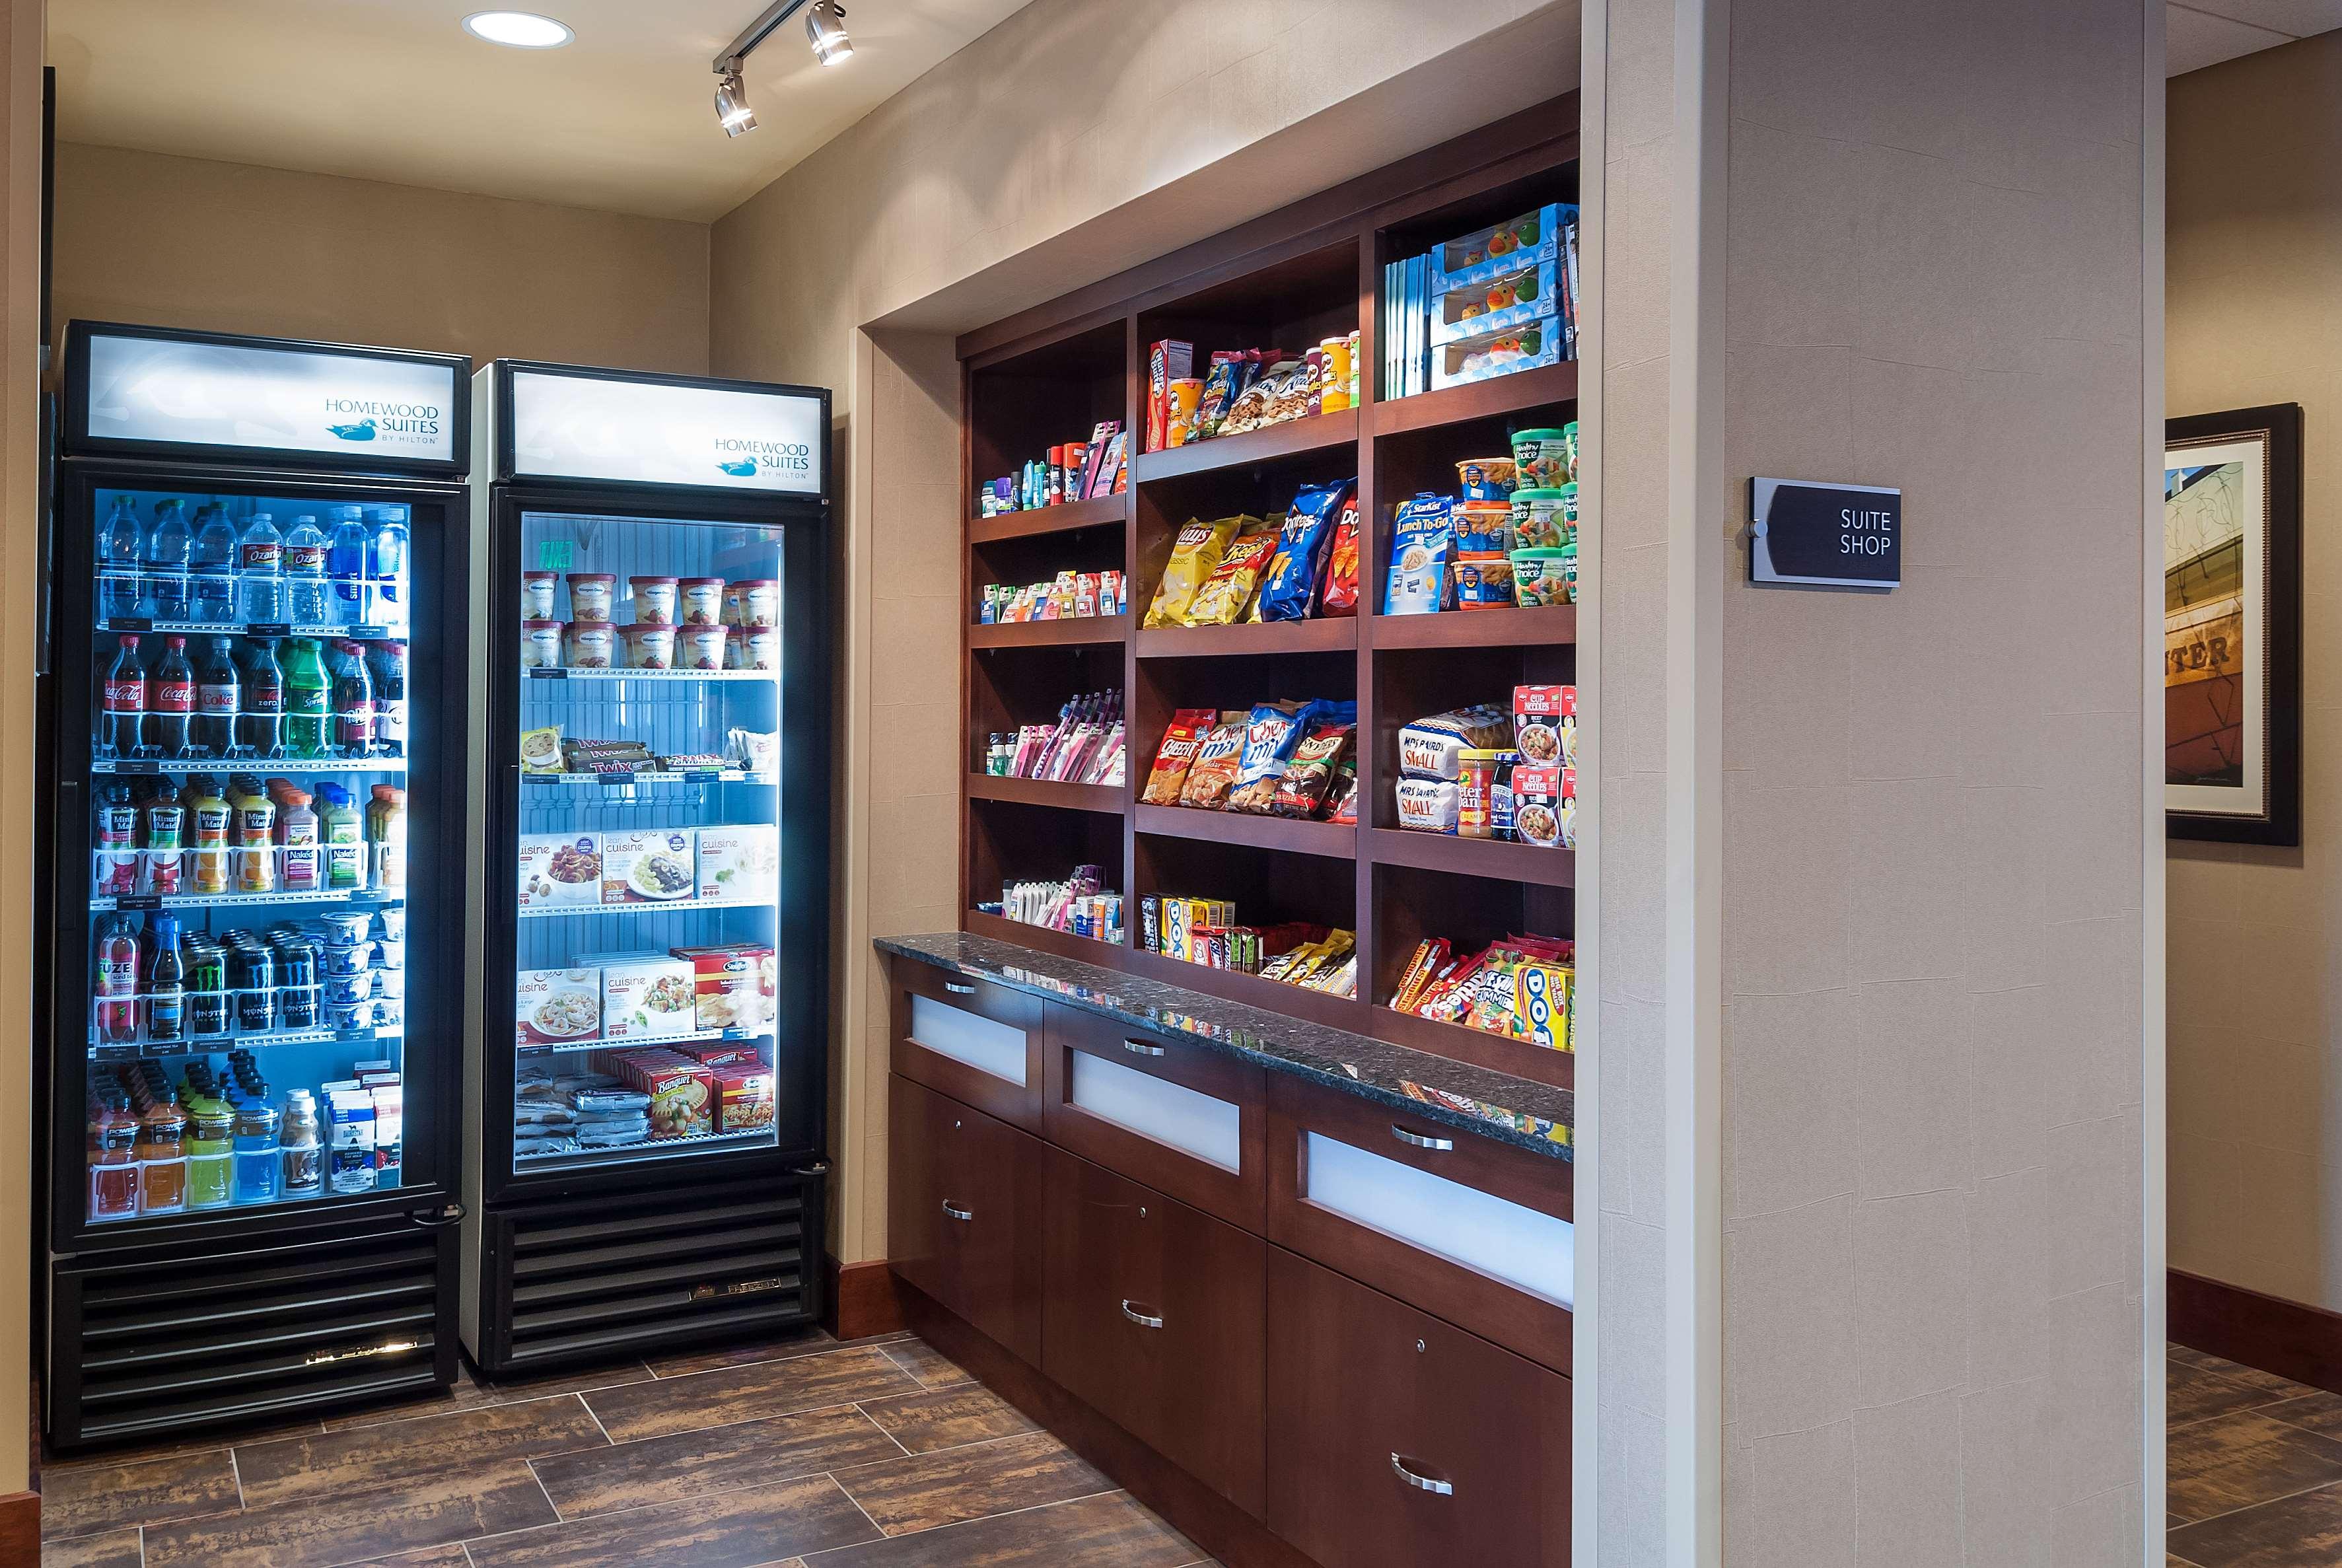 Homewood Suites by Hilton Fort Worth - Medical Center, TX image 5